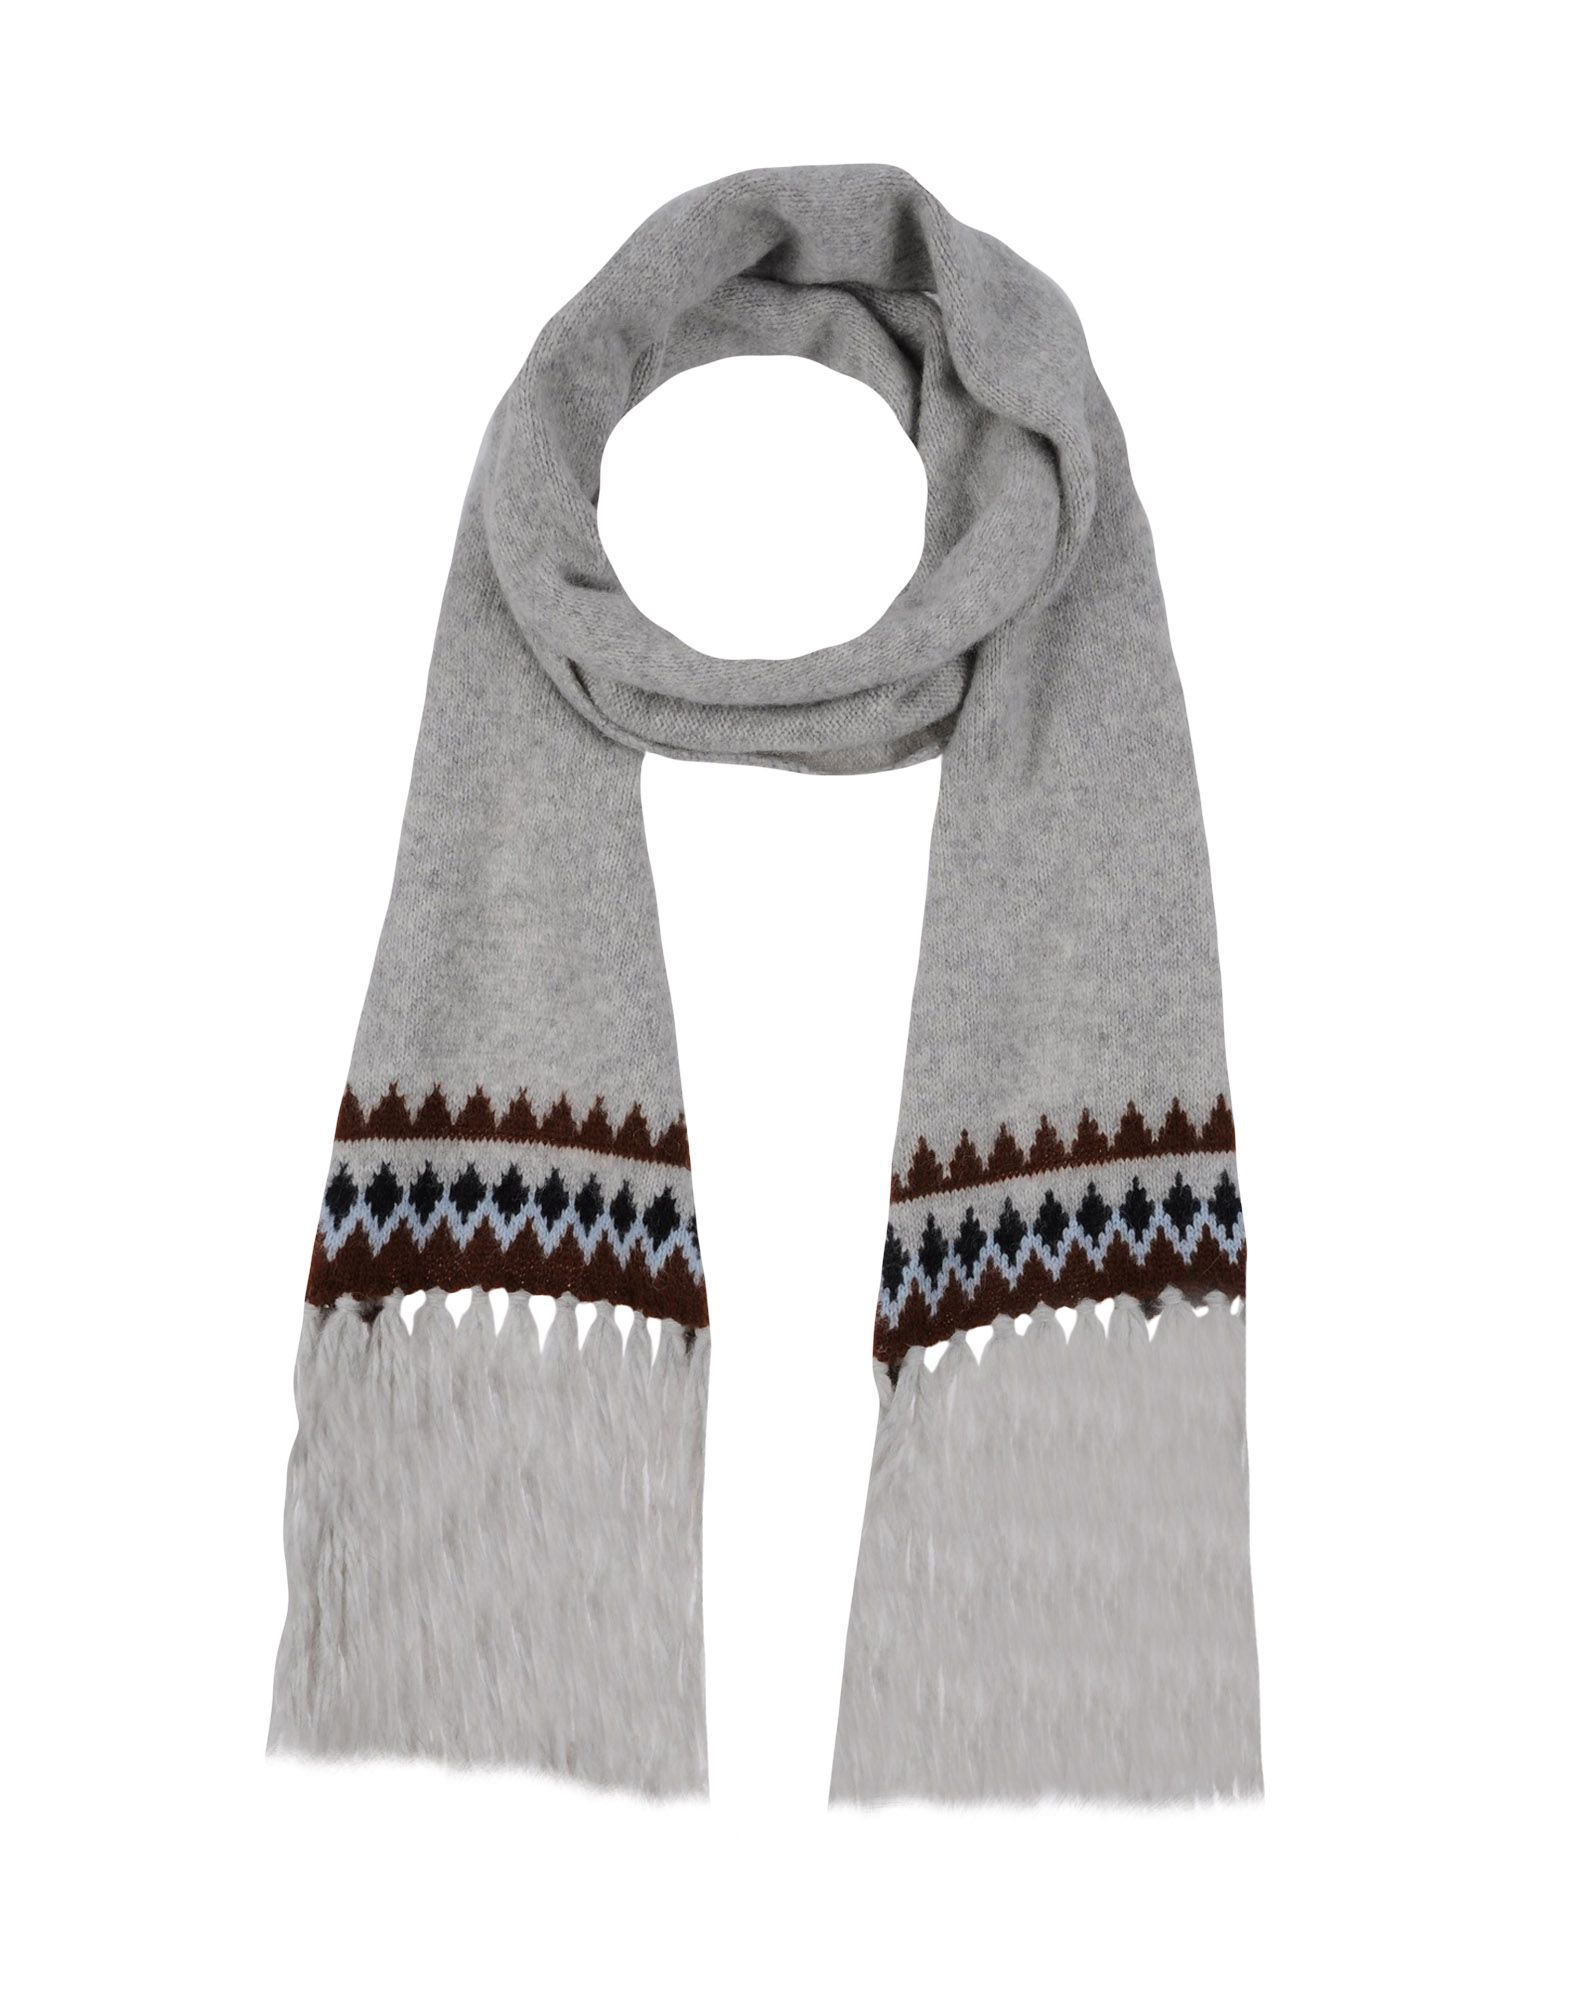 AMI ALEXANDRE MATTIUSSI Scarves in Light Grey